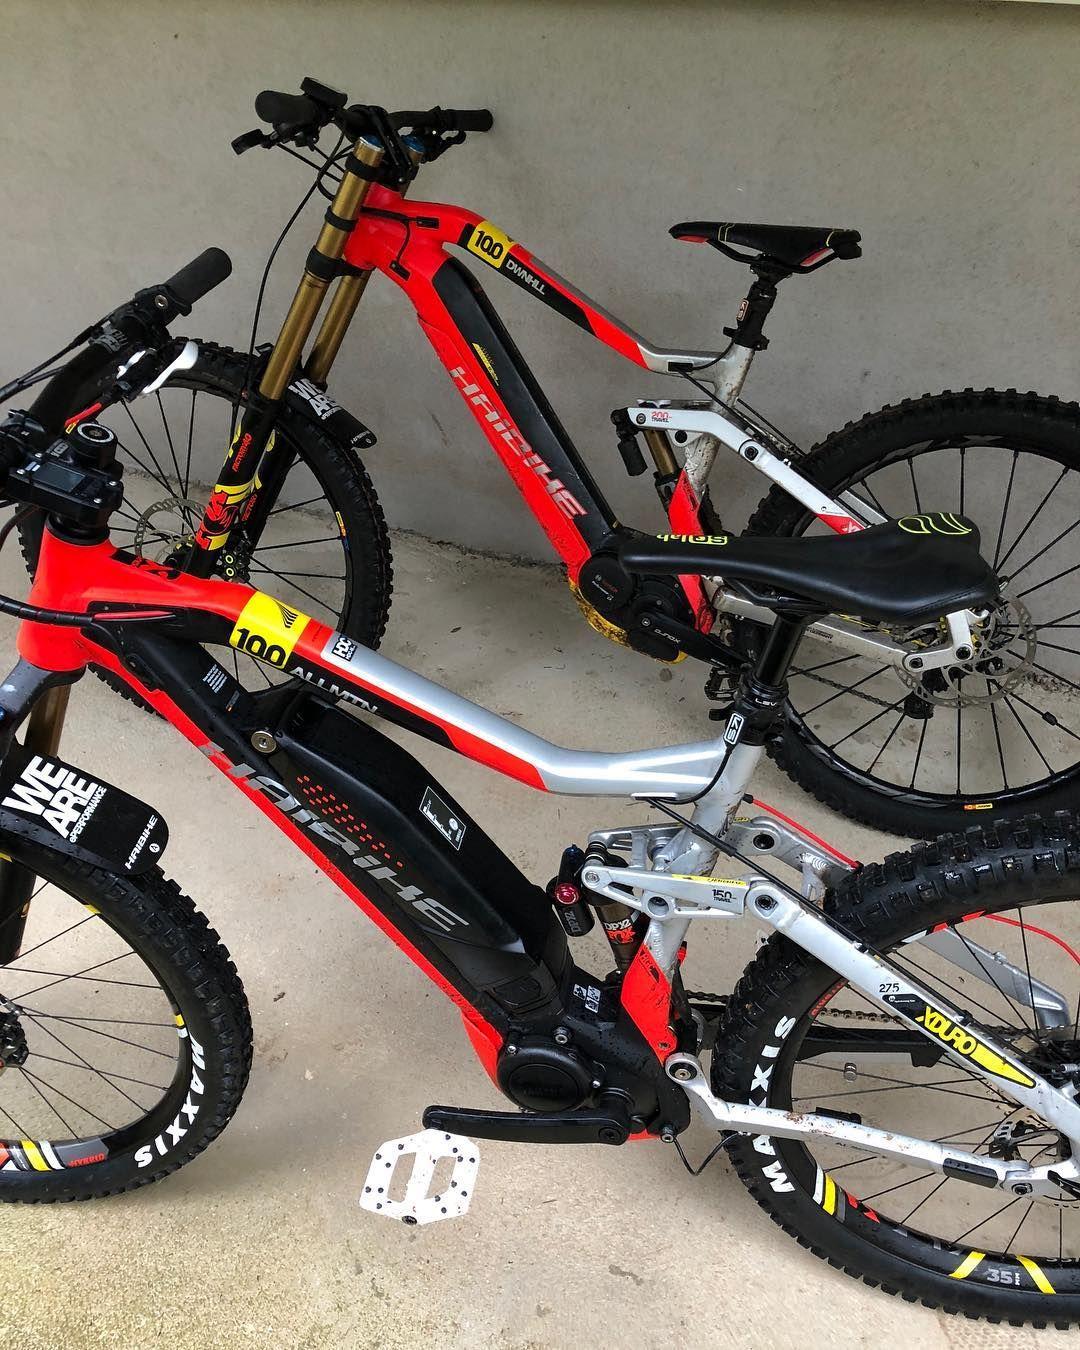 La Imagen Puede Contener Bicicleta Downhill Bike Bmx Bicycle